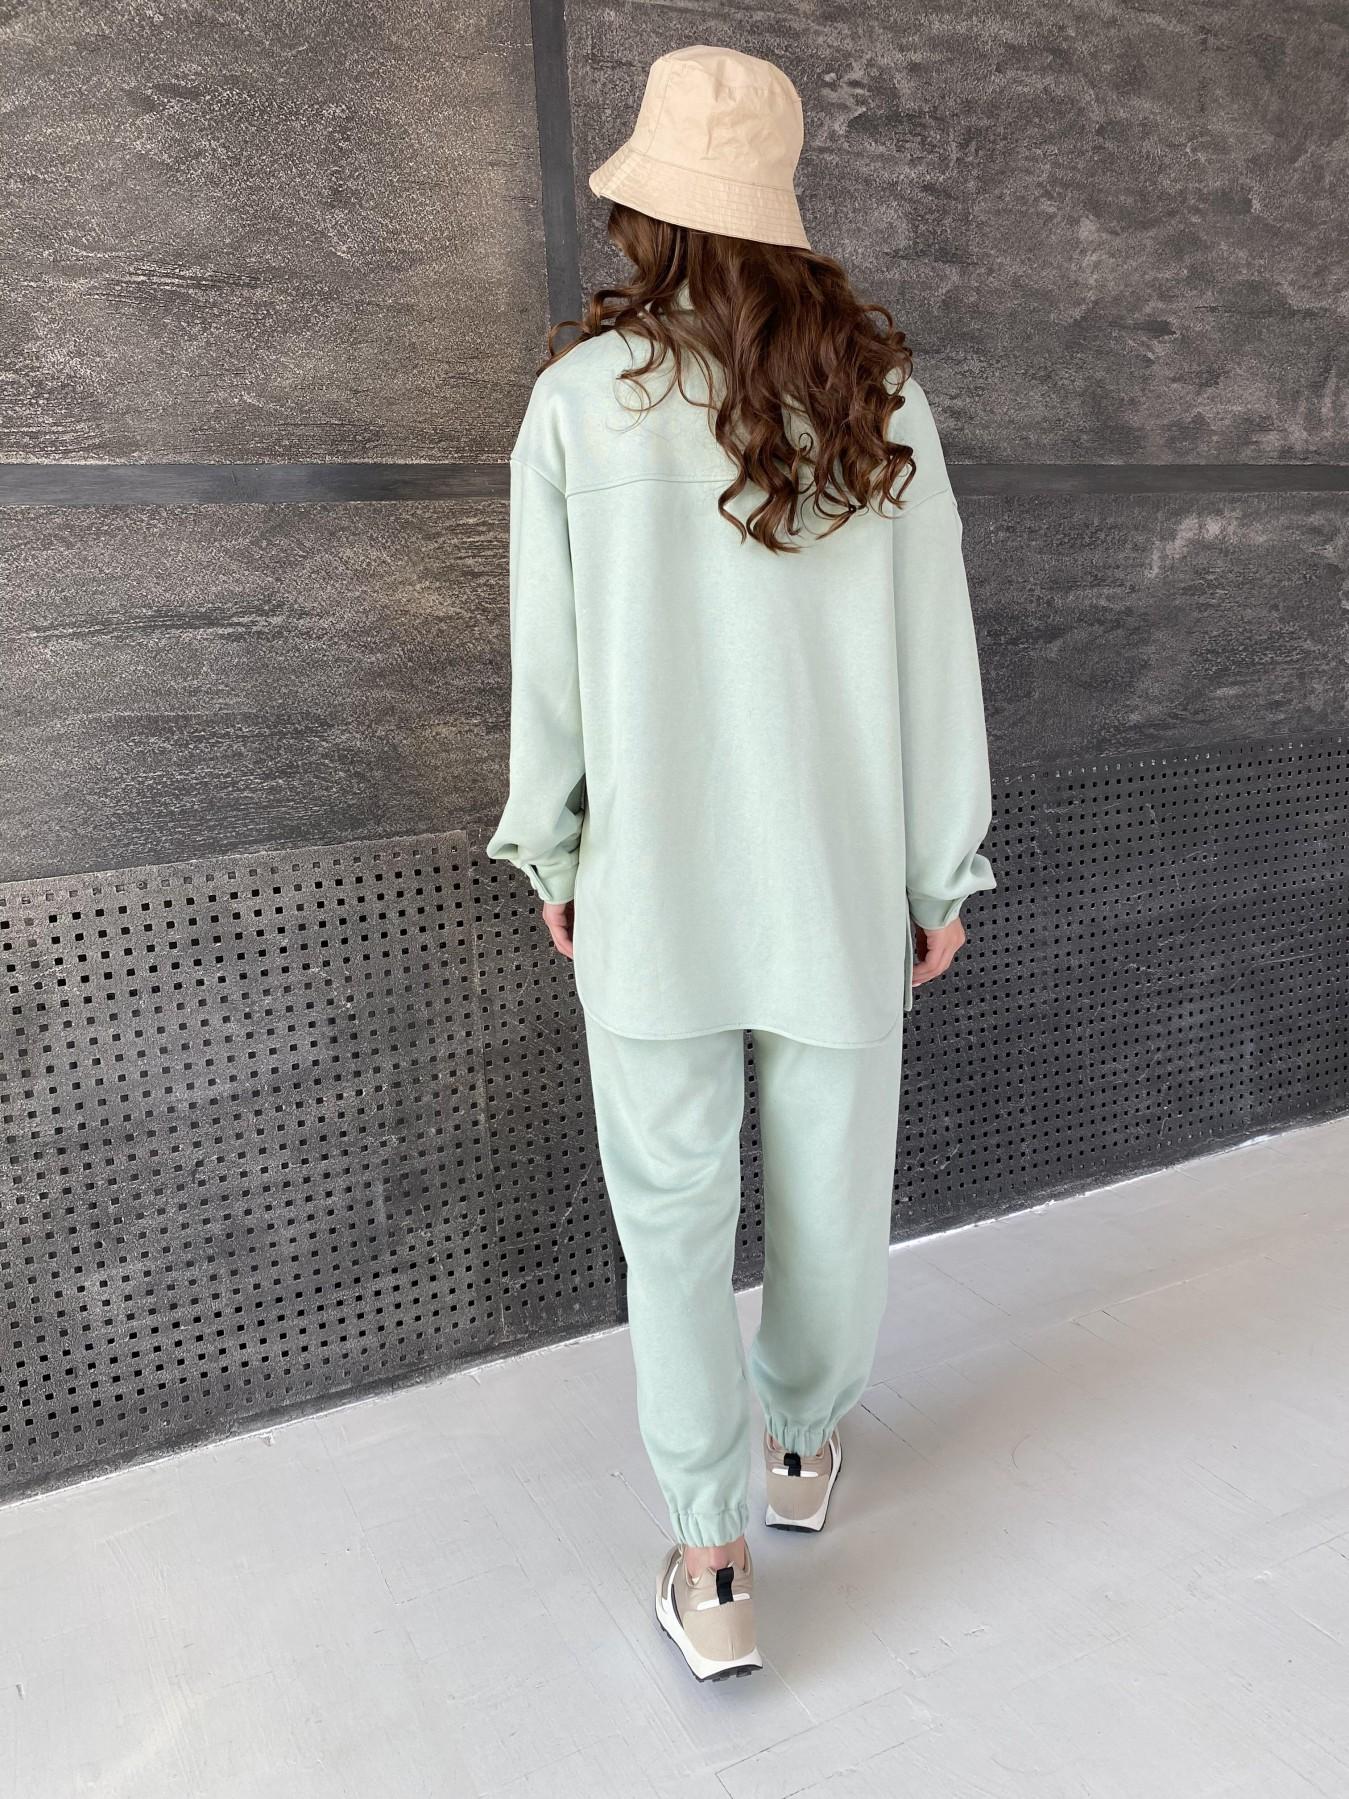 Респект костюм из трикотажа  3х нитка 11055 АРТ. 47576 Цвет: Олива Светлая - фото 7, интернет магазин tm-modus.ru